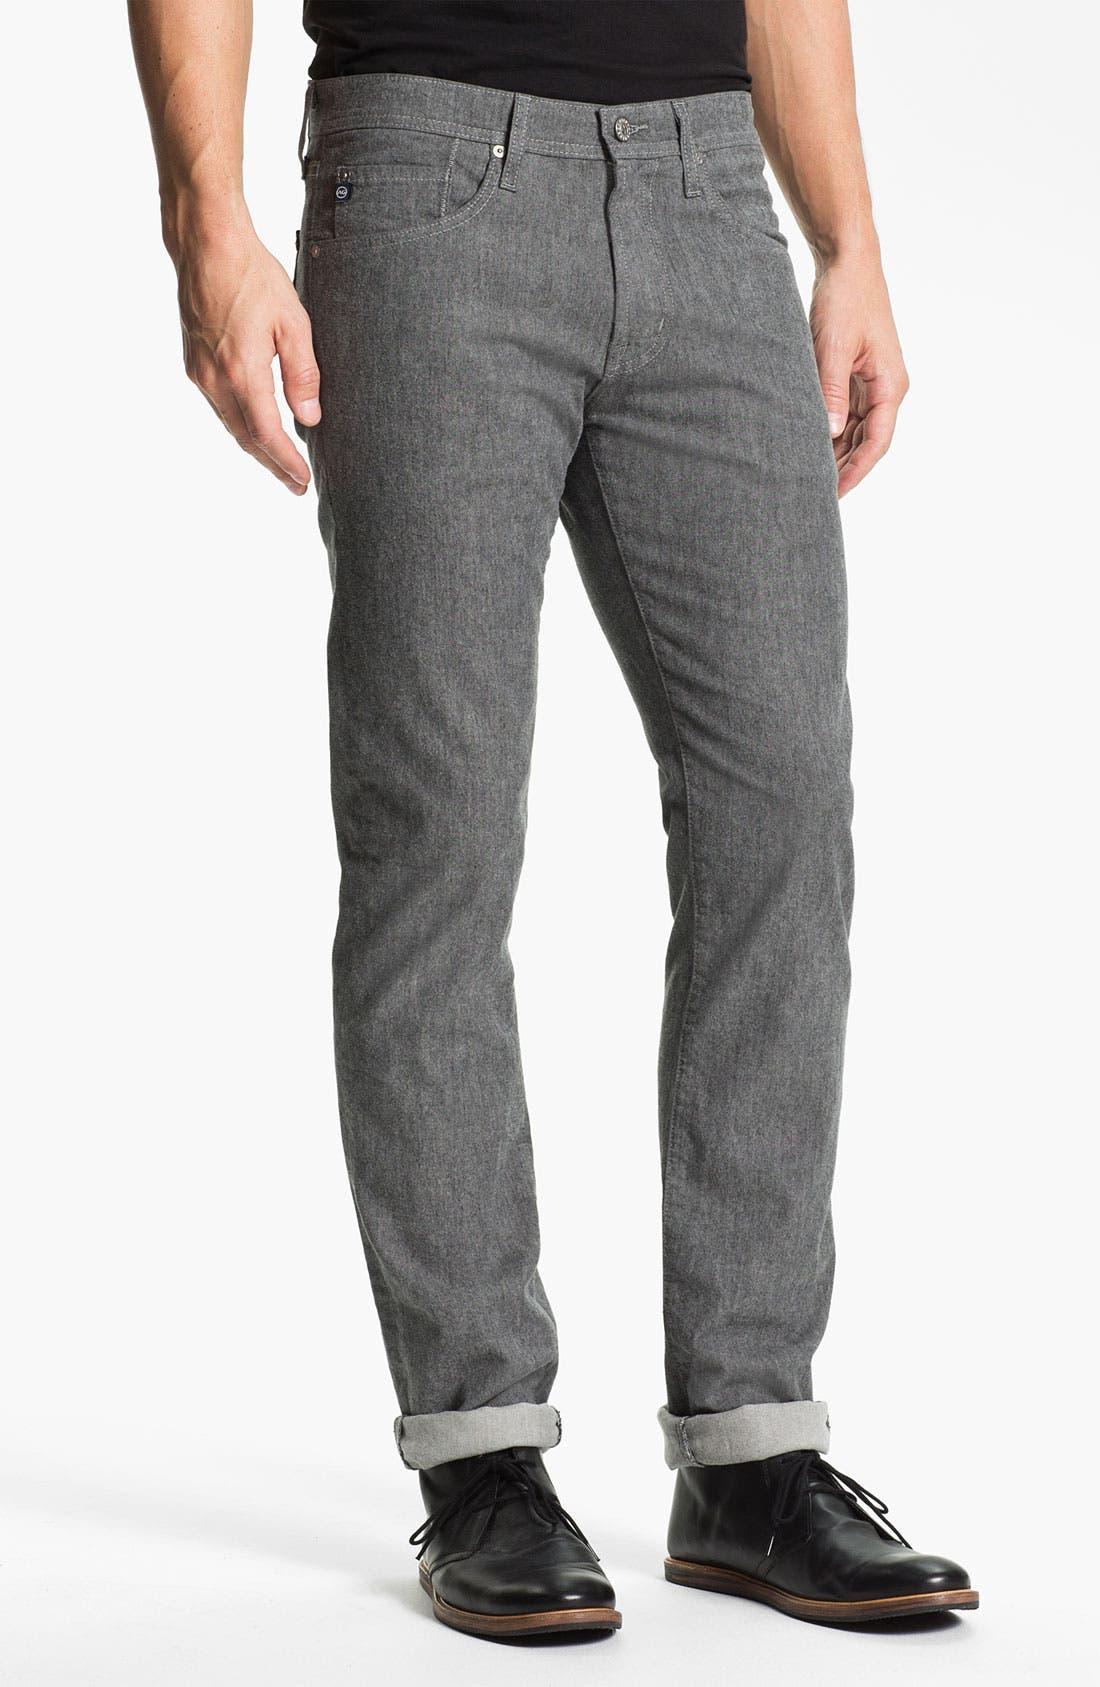 Main Image - AG Jeans 'Matchbox' Slim Straight Leg Jeans (Tweed Grey)